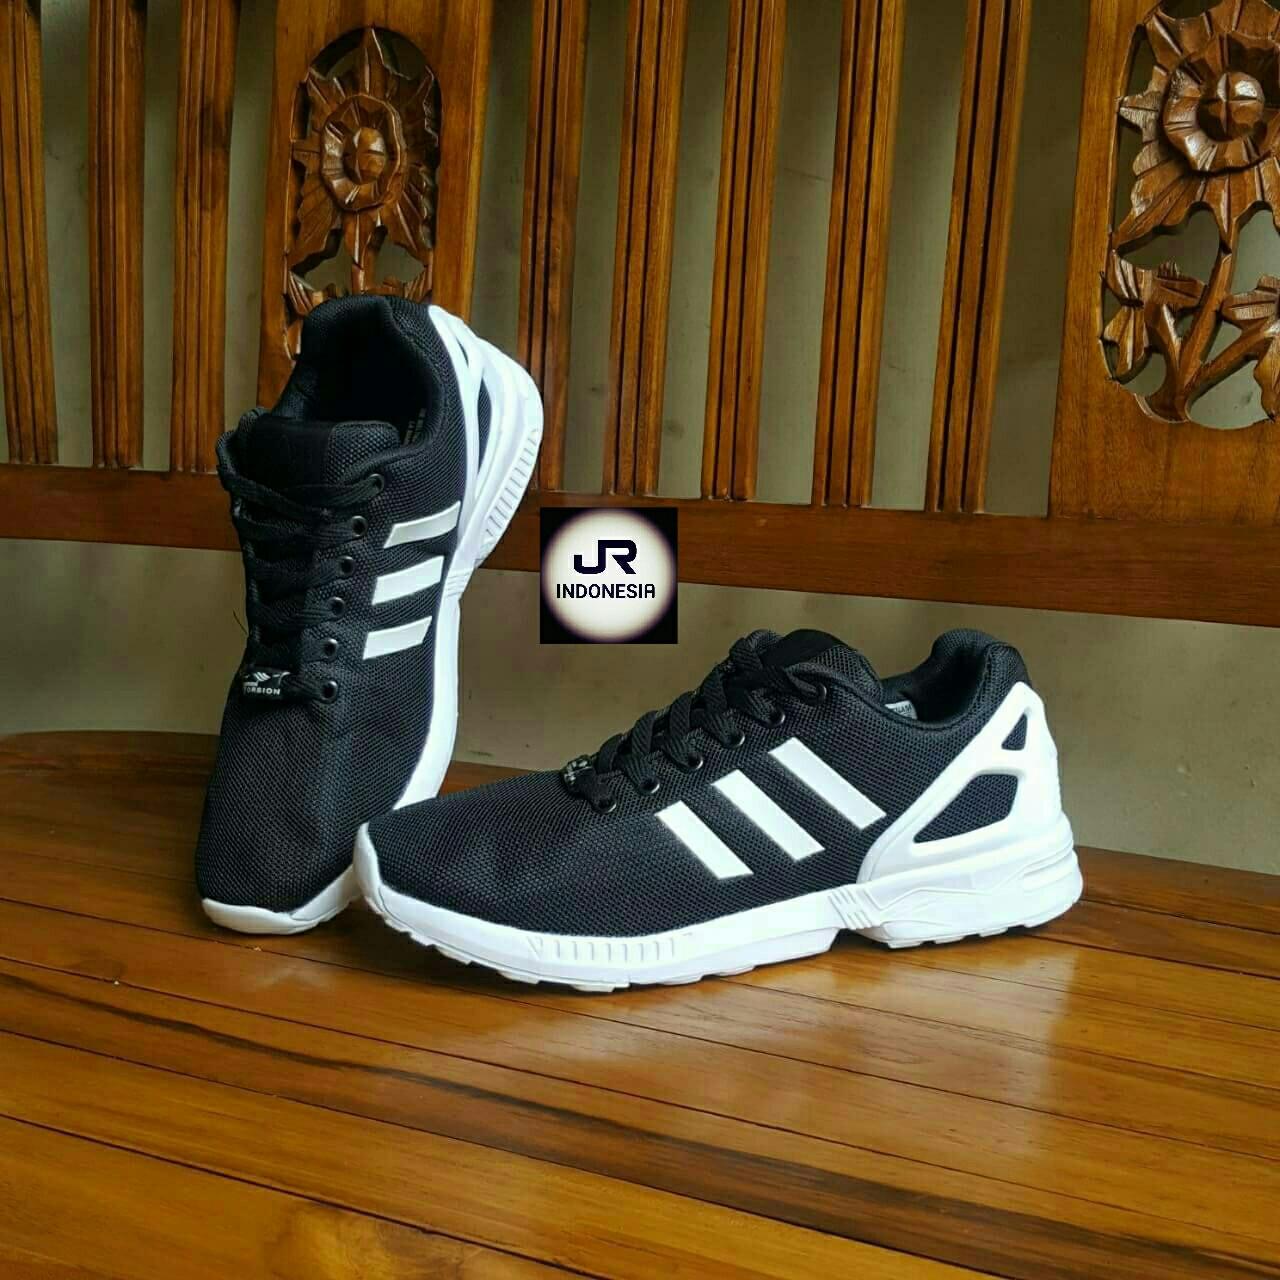 innovative design 4014a efc8d ... store italy sneakers sepatu adidas zx flux hitam list putih grade  original c6898 744e9 low price